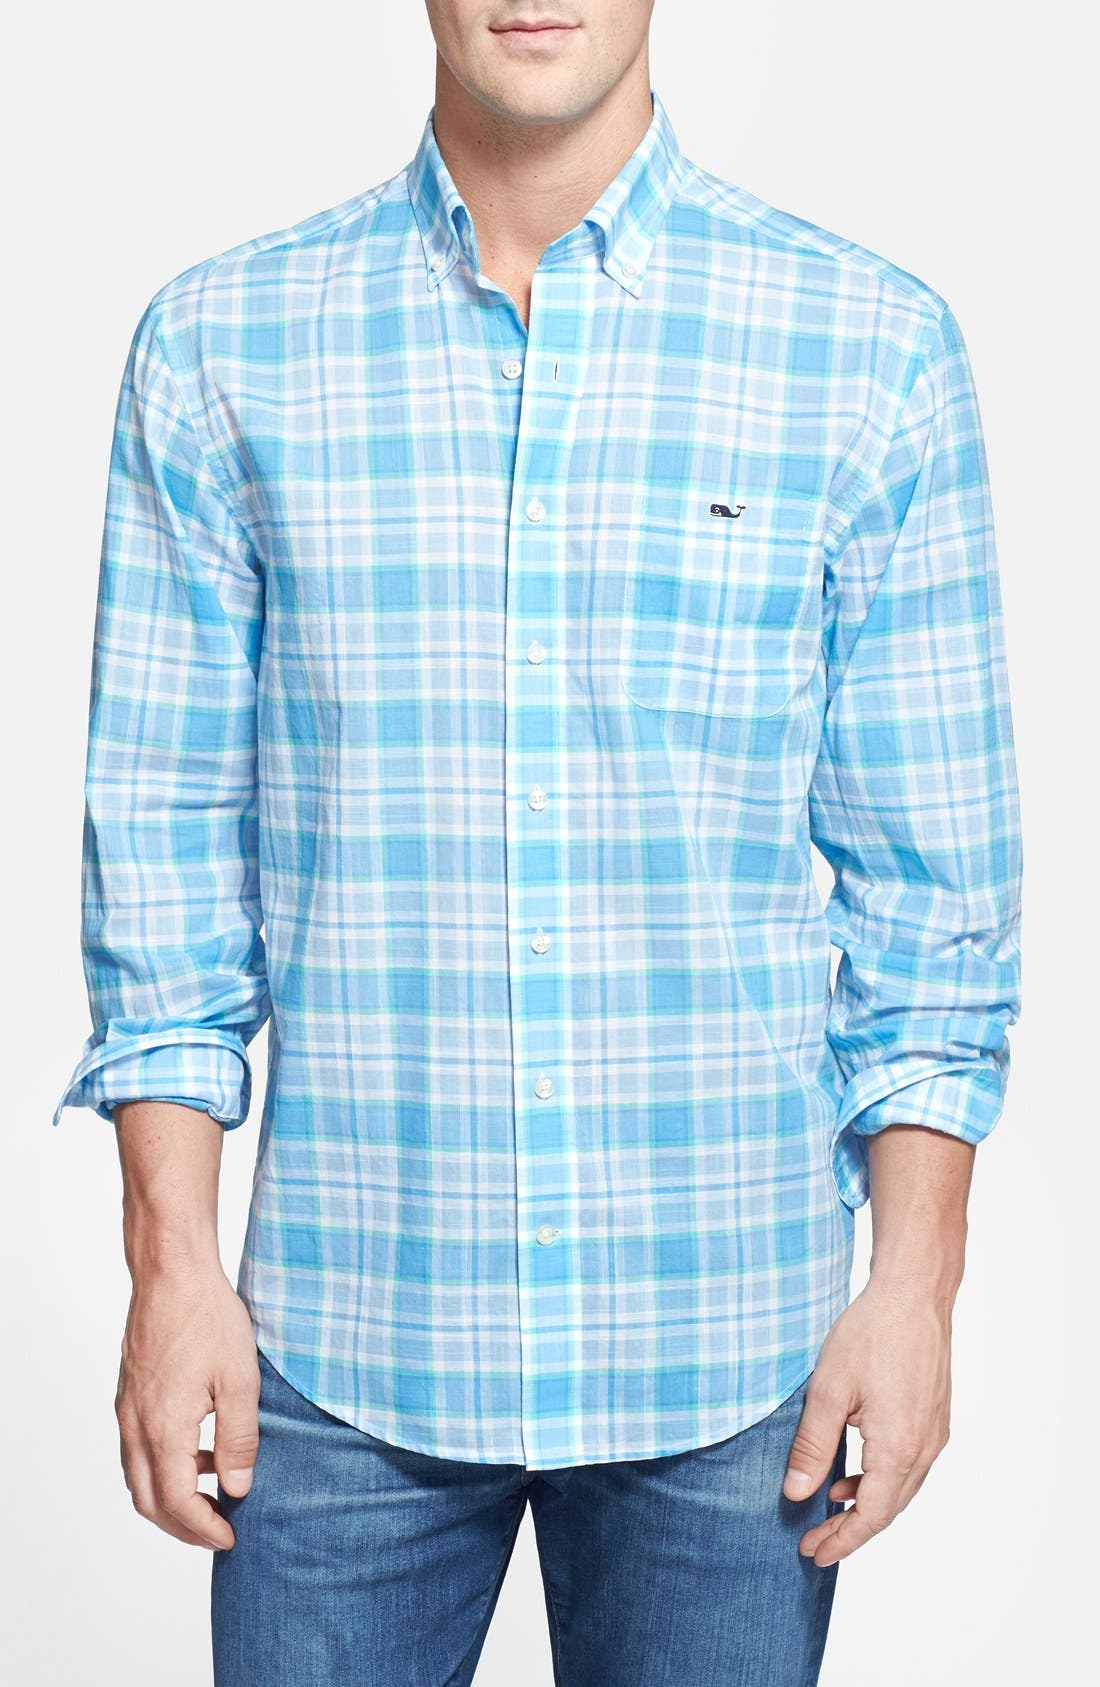 Main Image - Vineyard Vines 'Tucker' Classic Fit Plaid Sport Shirt